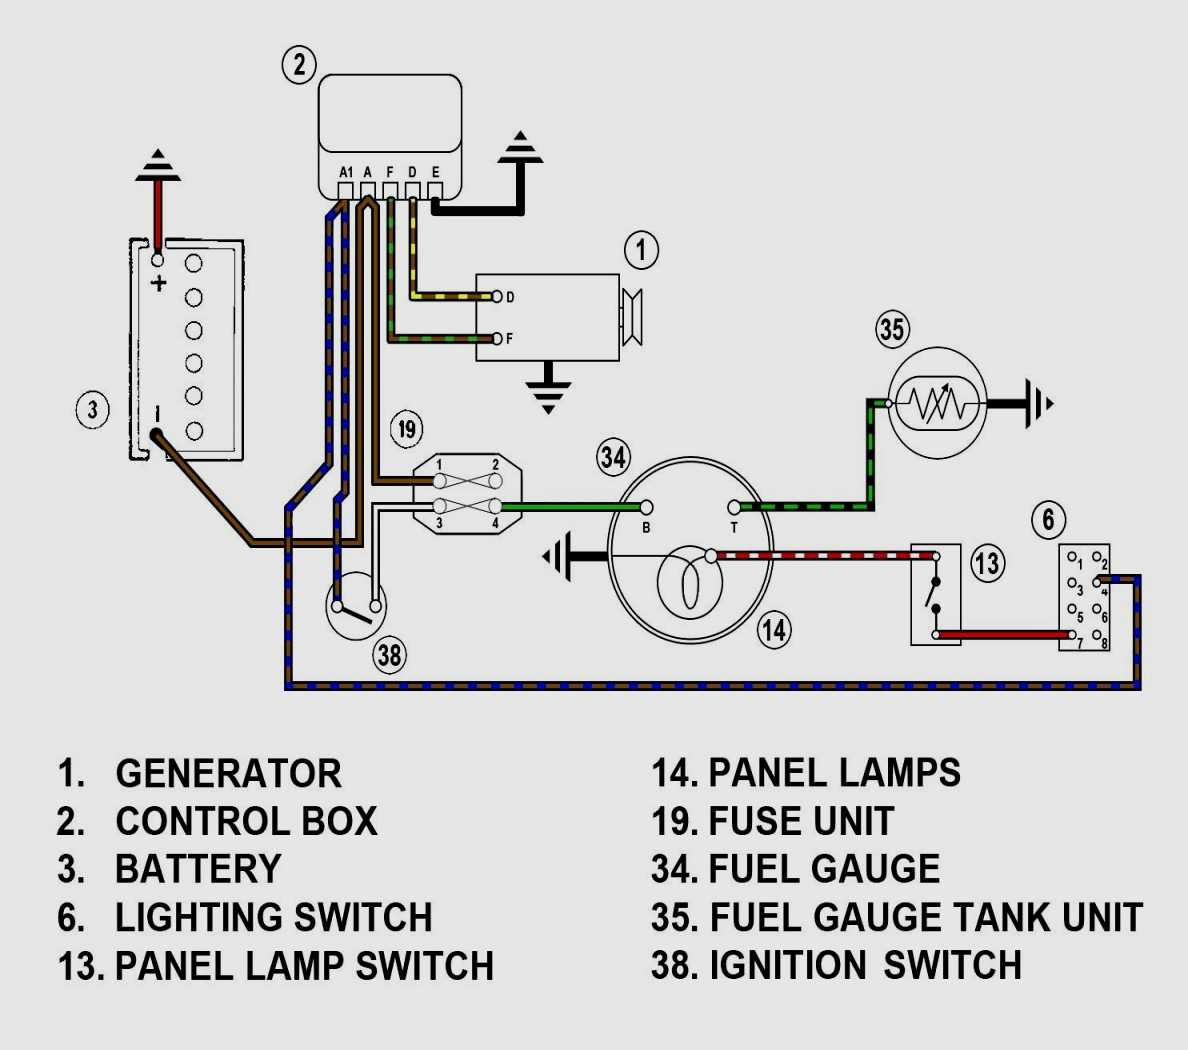 Sunpro Super Tach 2 Wiring Diagram | Manual E-Books - Sunpro Super Tach 2 Wiring Diagram